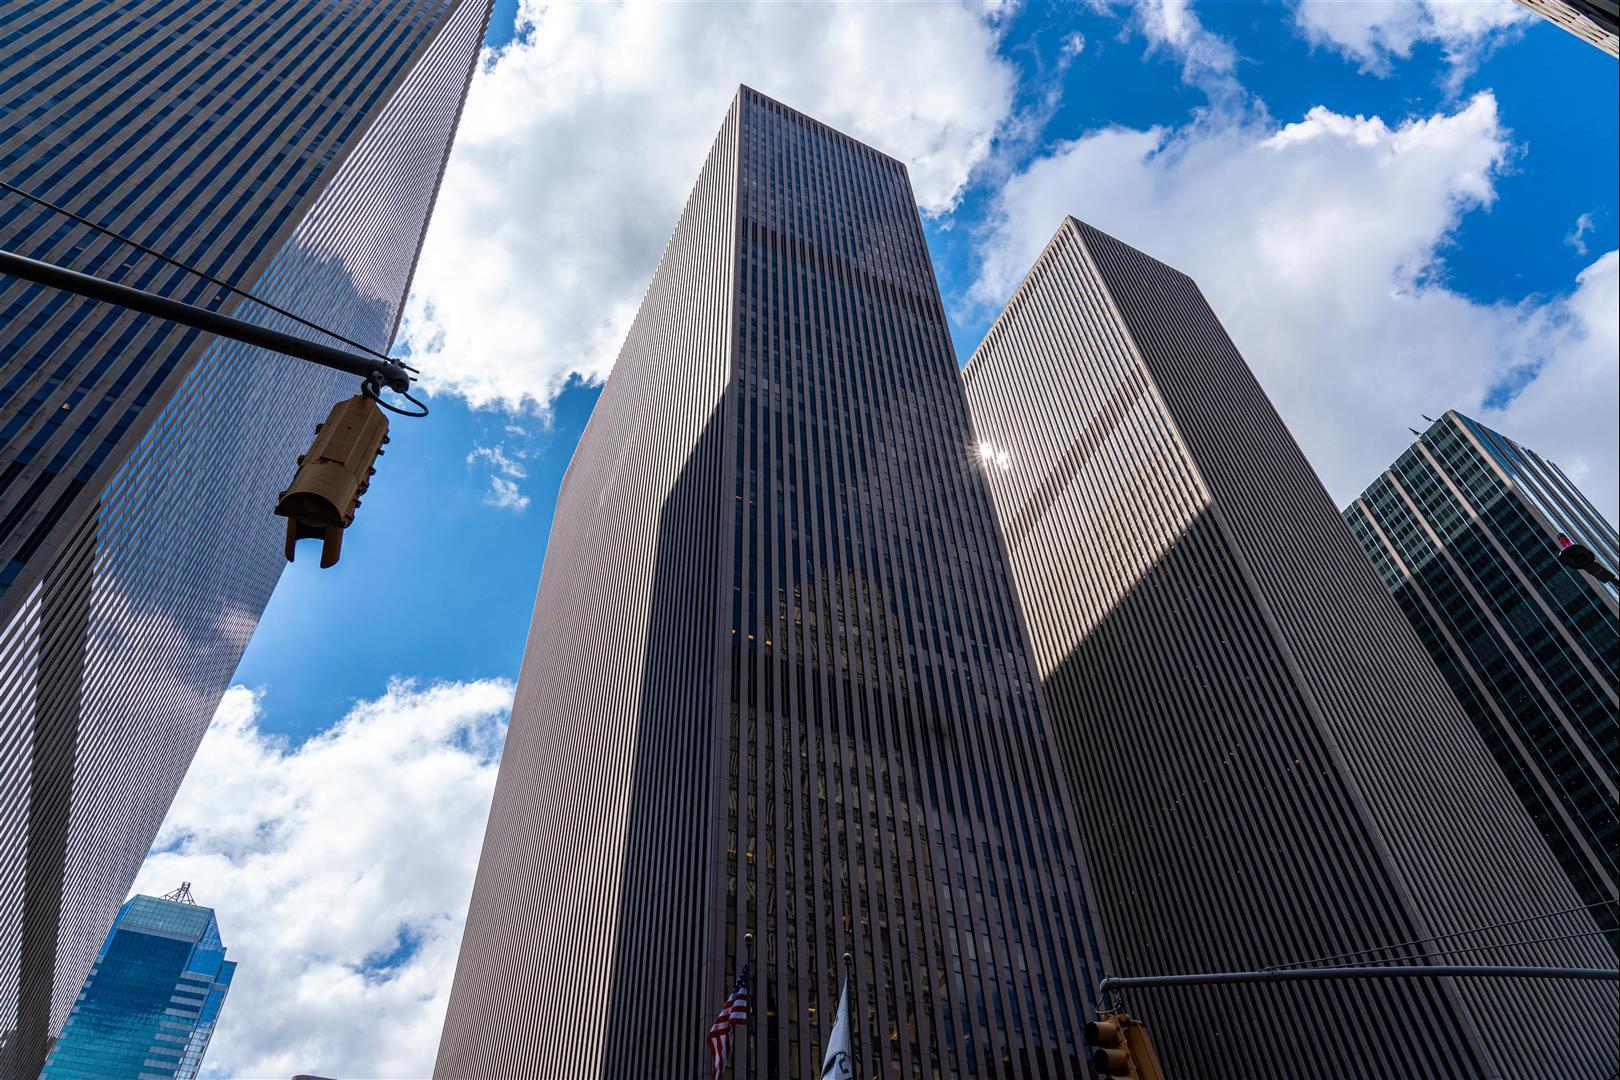 洛克菲勒中心 Rockefeller Center